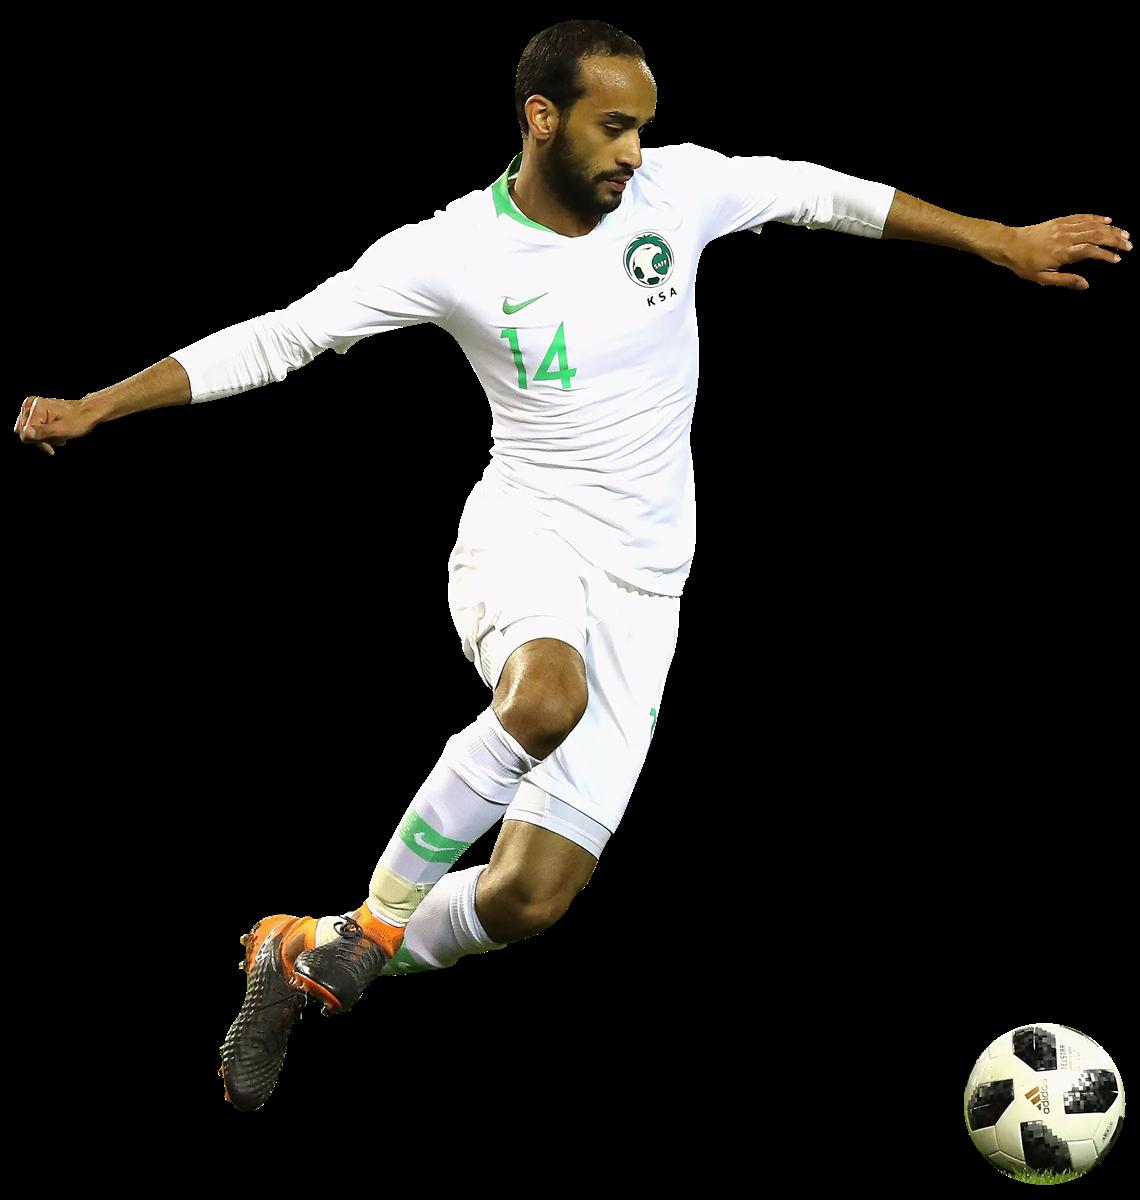 Abdullah Ateefrender